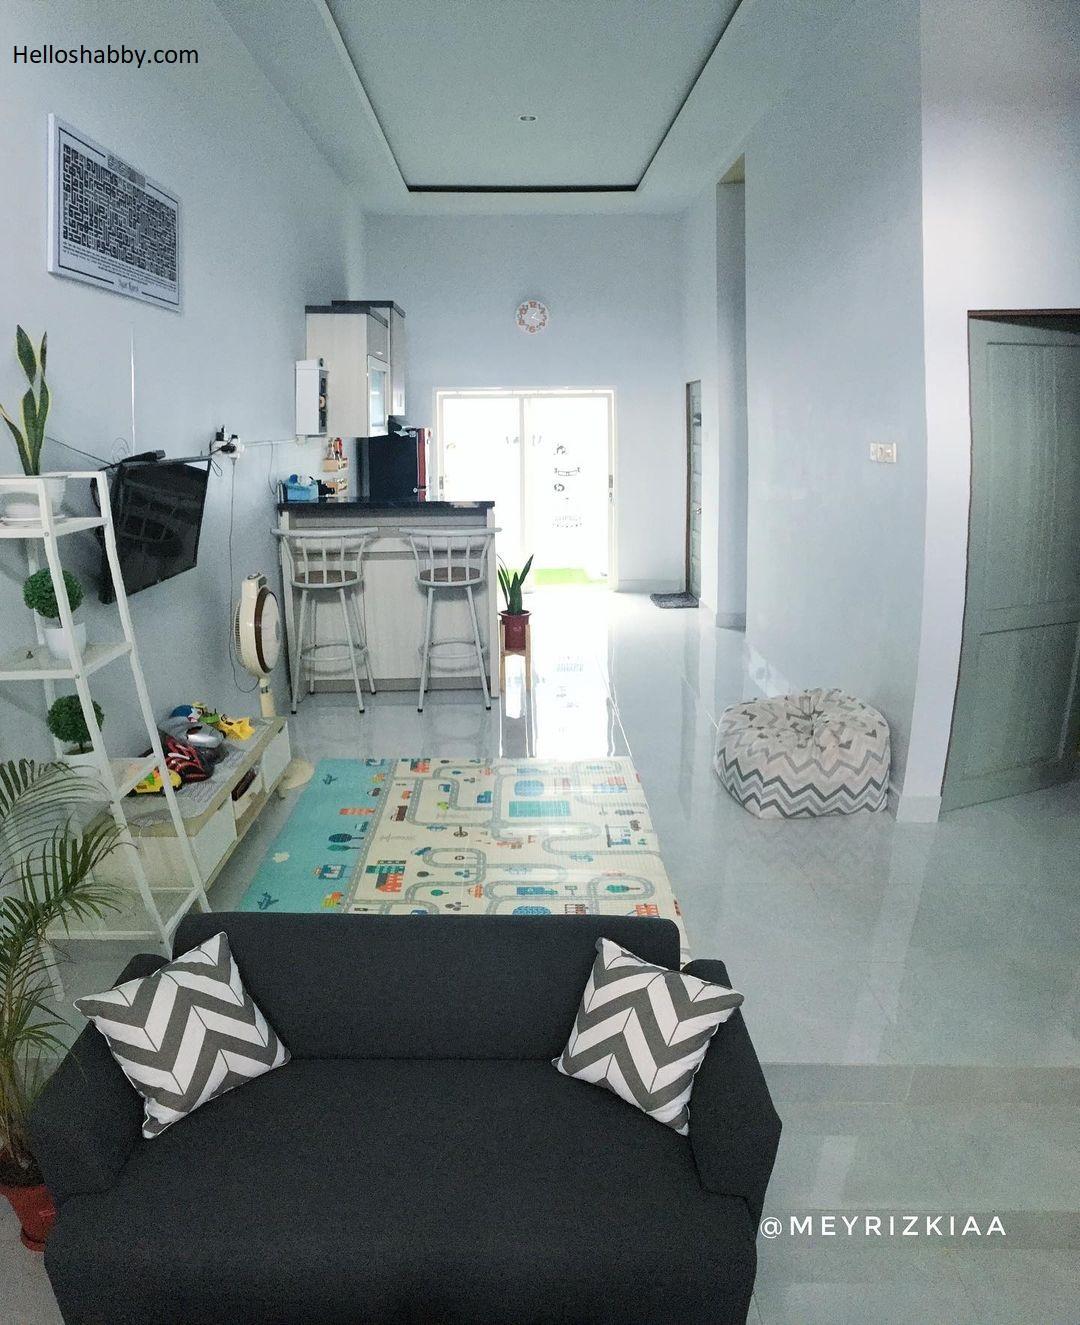 7 Inspirasi Penataan Rumah Mungil Tanpa Sekat Tetap Nyaman Meski Terbatasnya Luas Bangunan Helloshabby Com Interior And Exterior Solutions